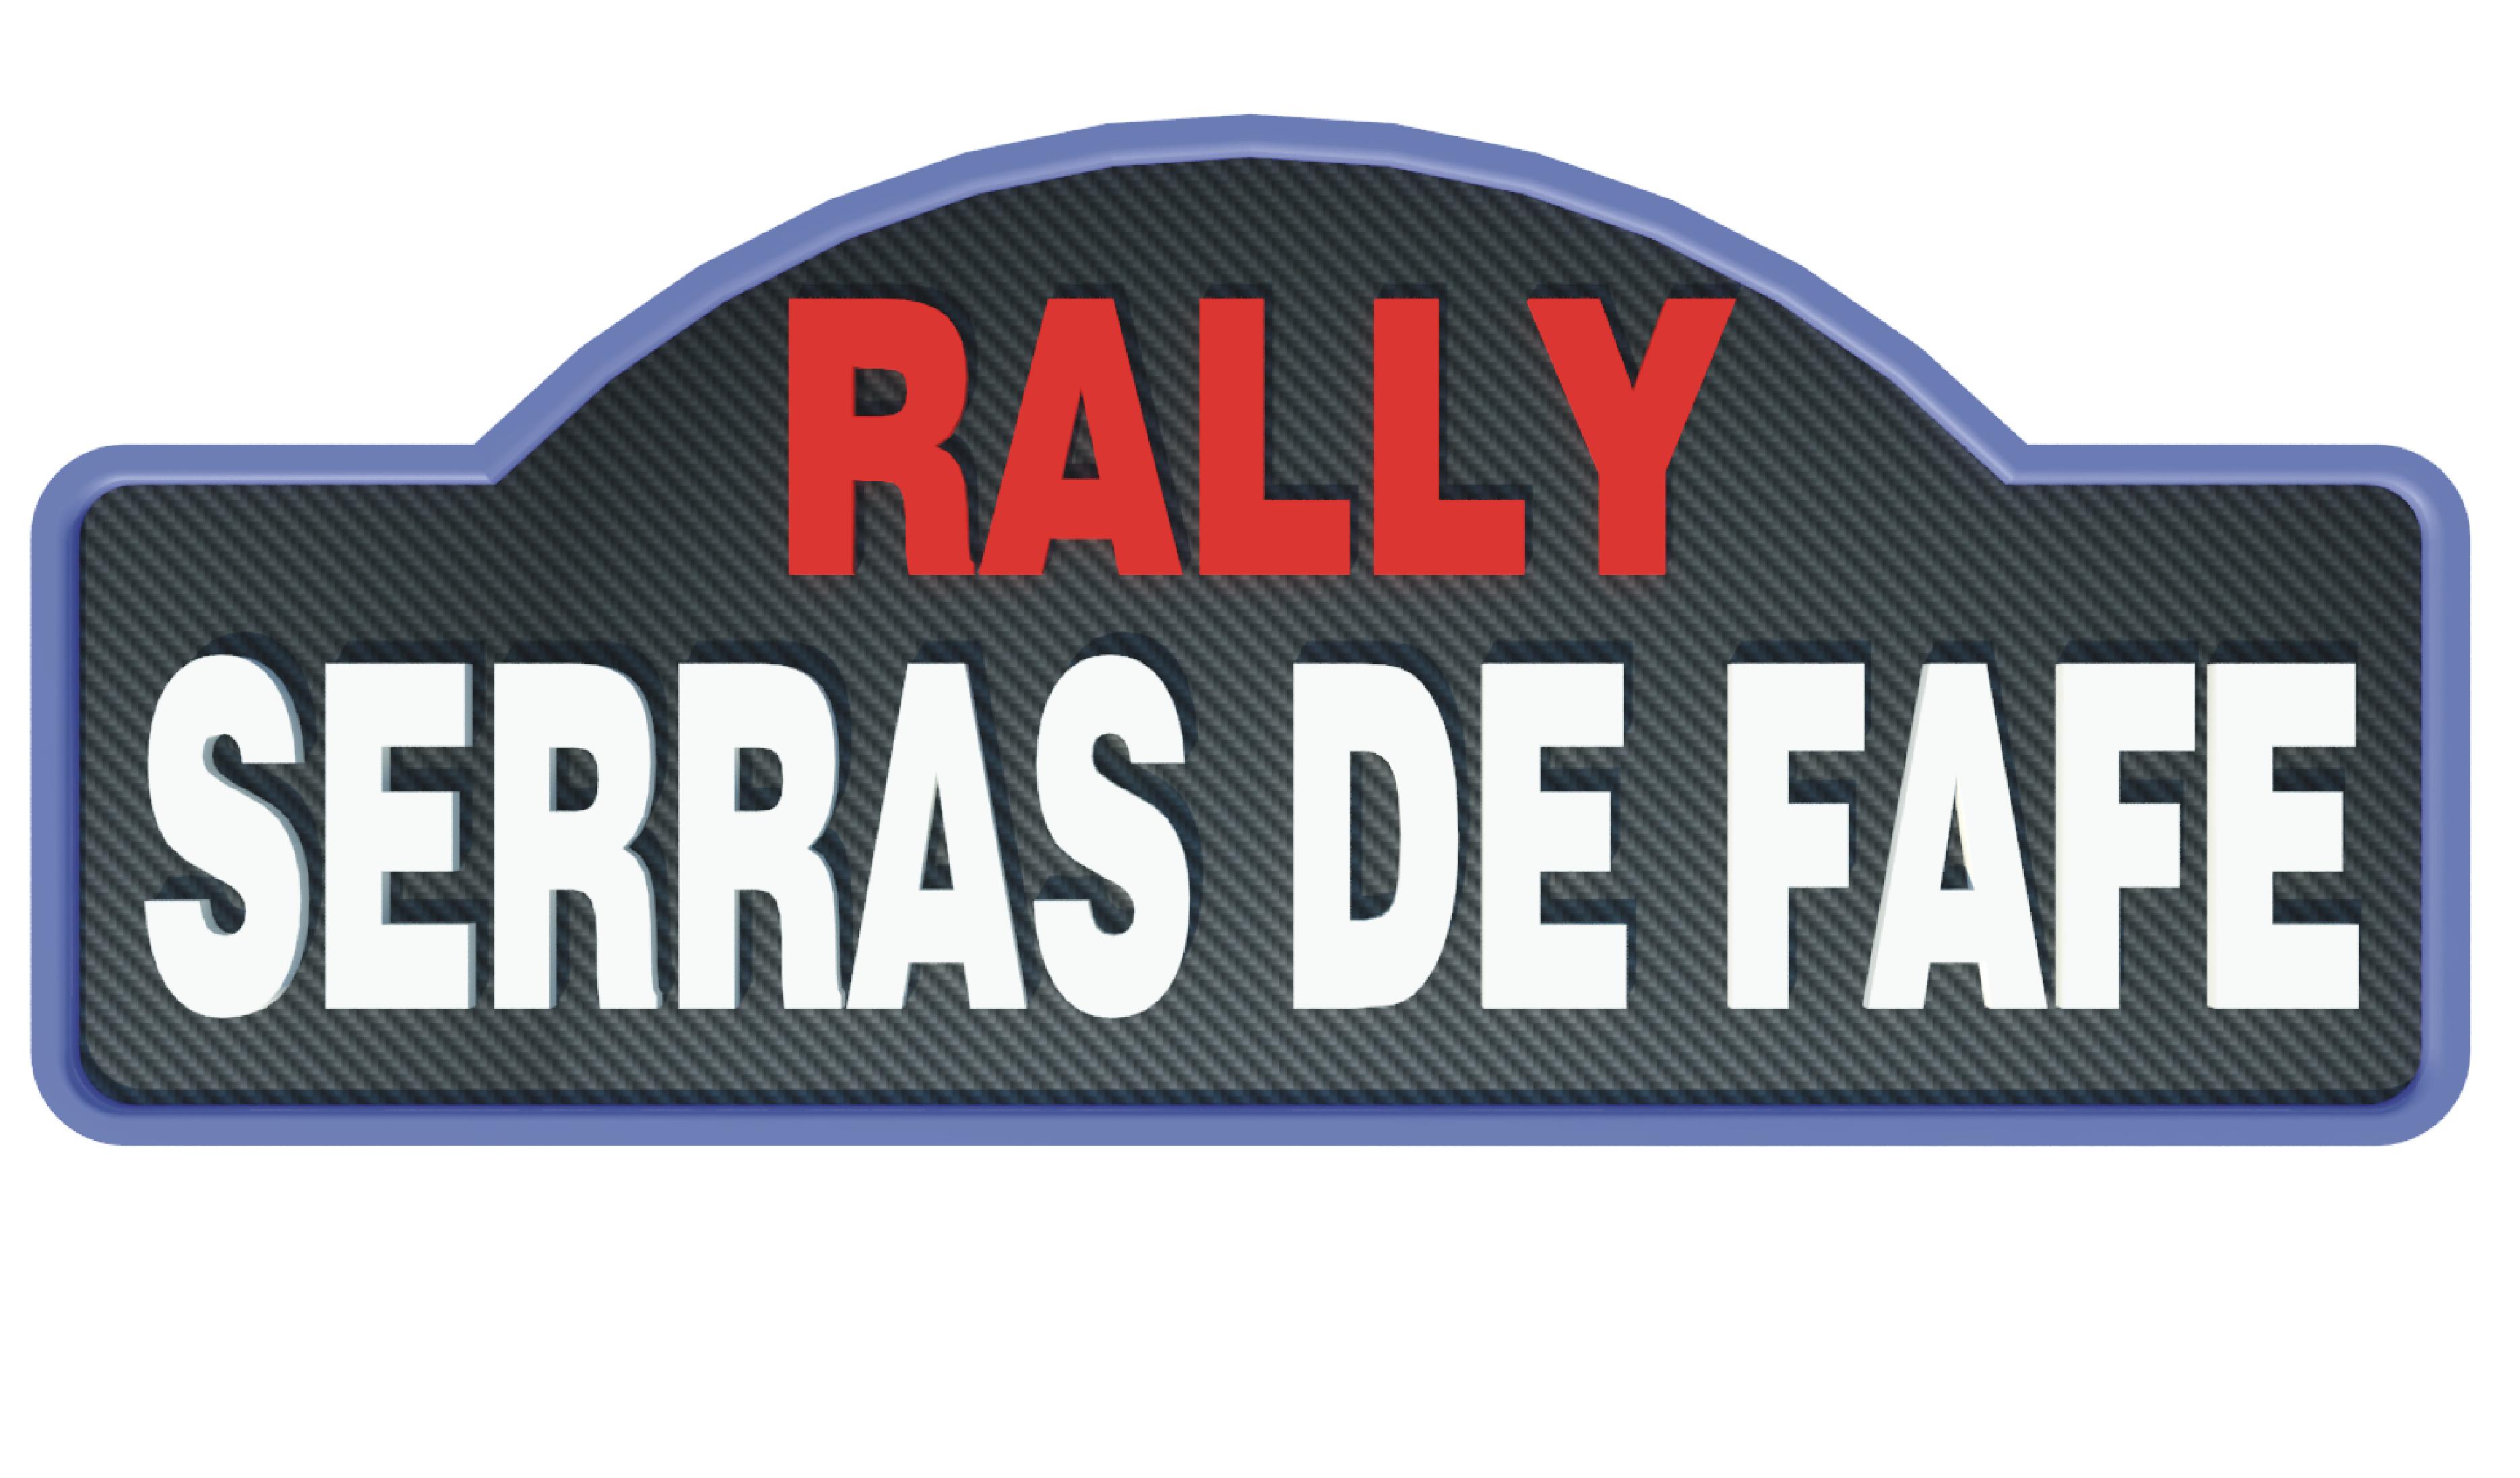 PlacaRallySerrasdeFafe.png